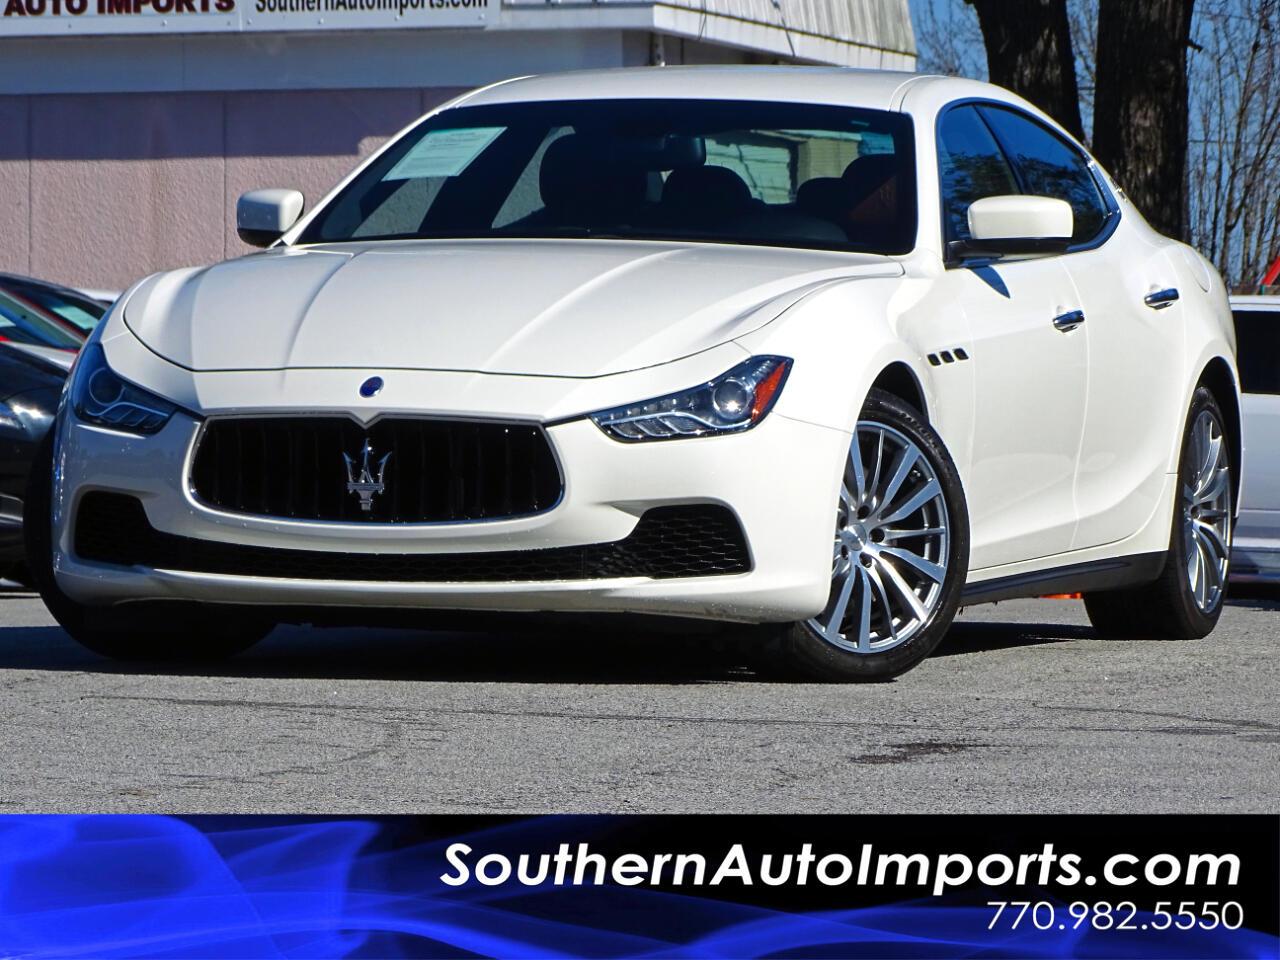 2015 Maserati Ghibli Luxury w/Navigation 1owner